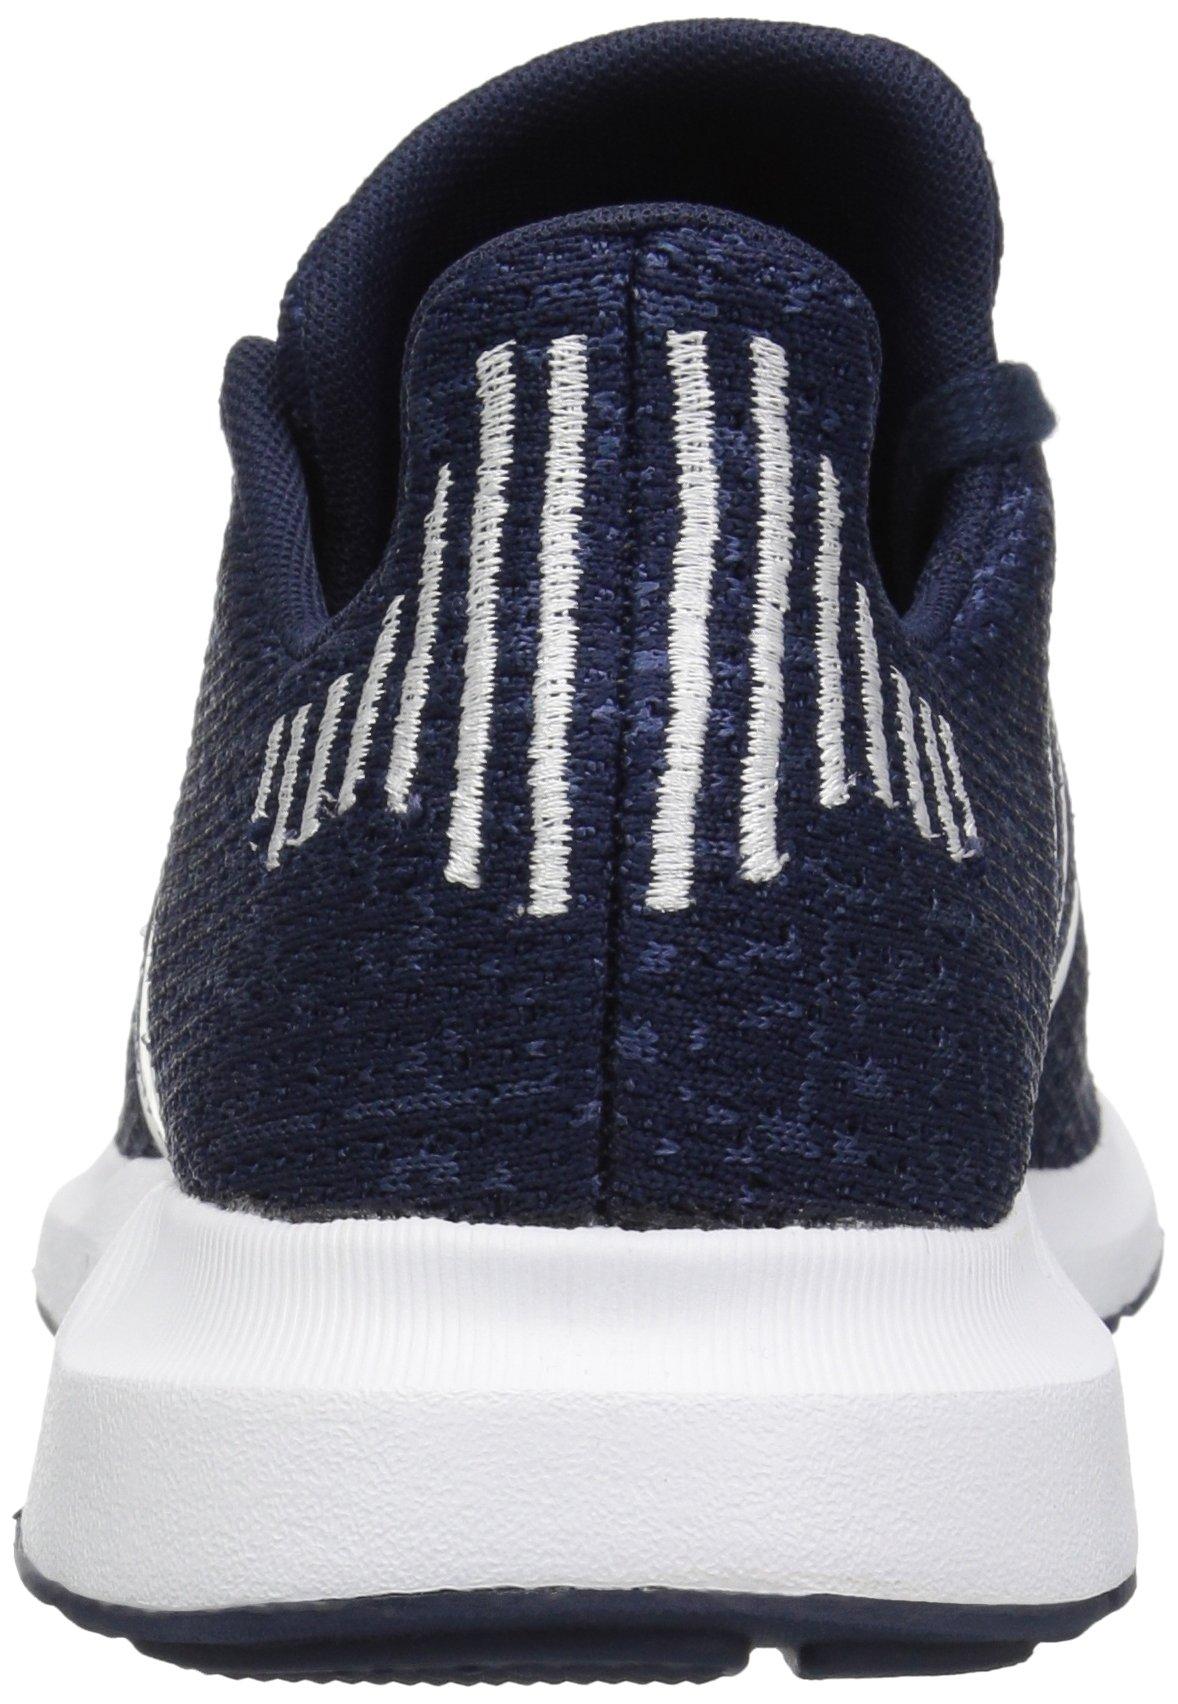 adidas Originals Baby Swift Running Shoe, Collegiate Navy/White/Mystery Blue, 4K M US Toddler by adidas Originals (Image #2)